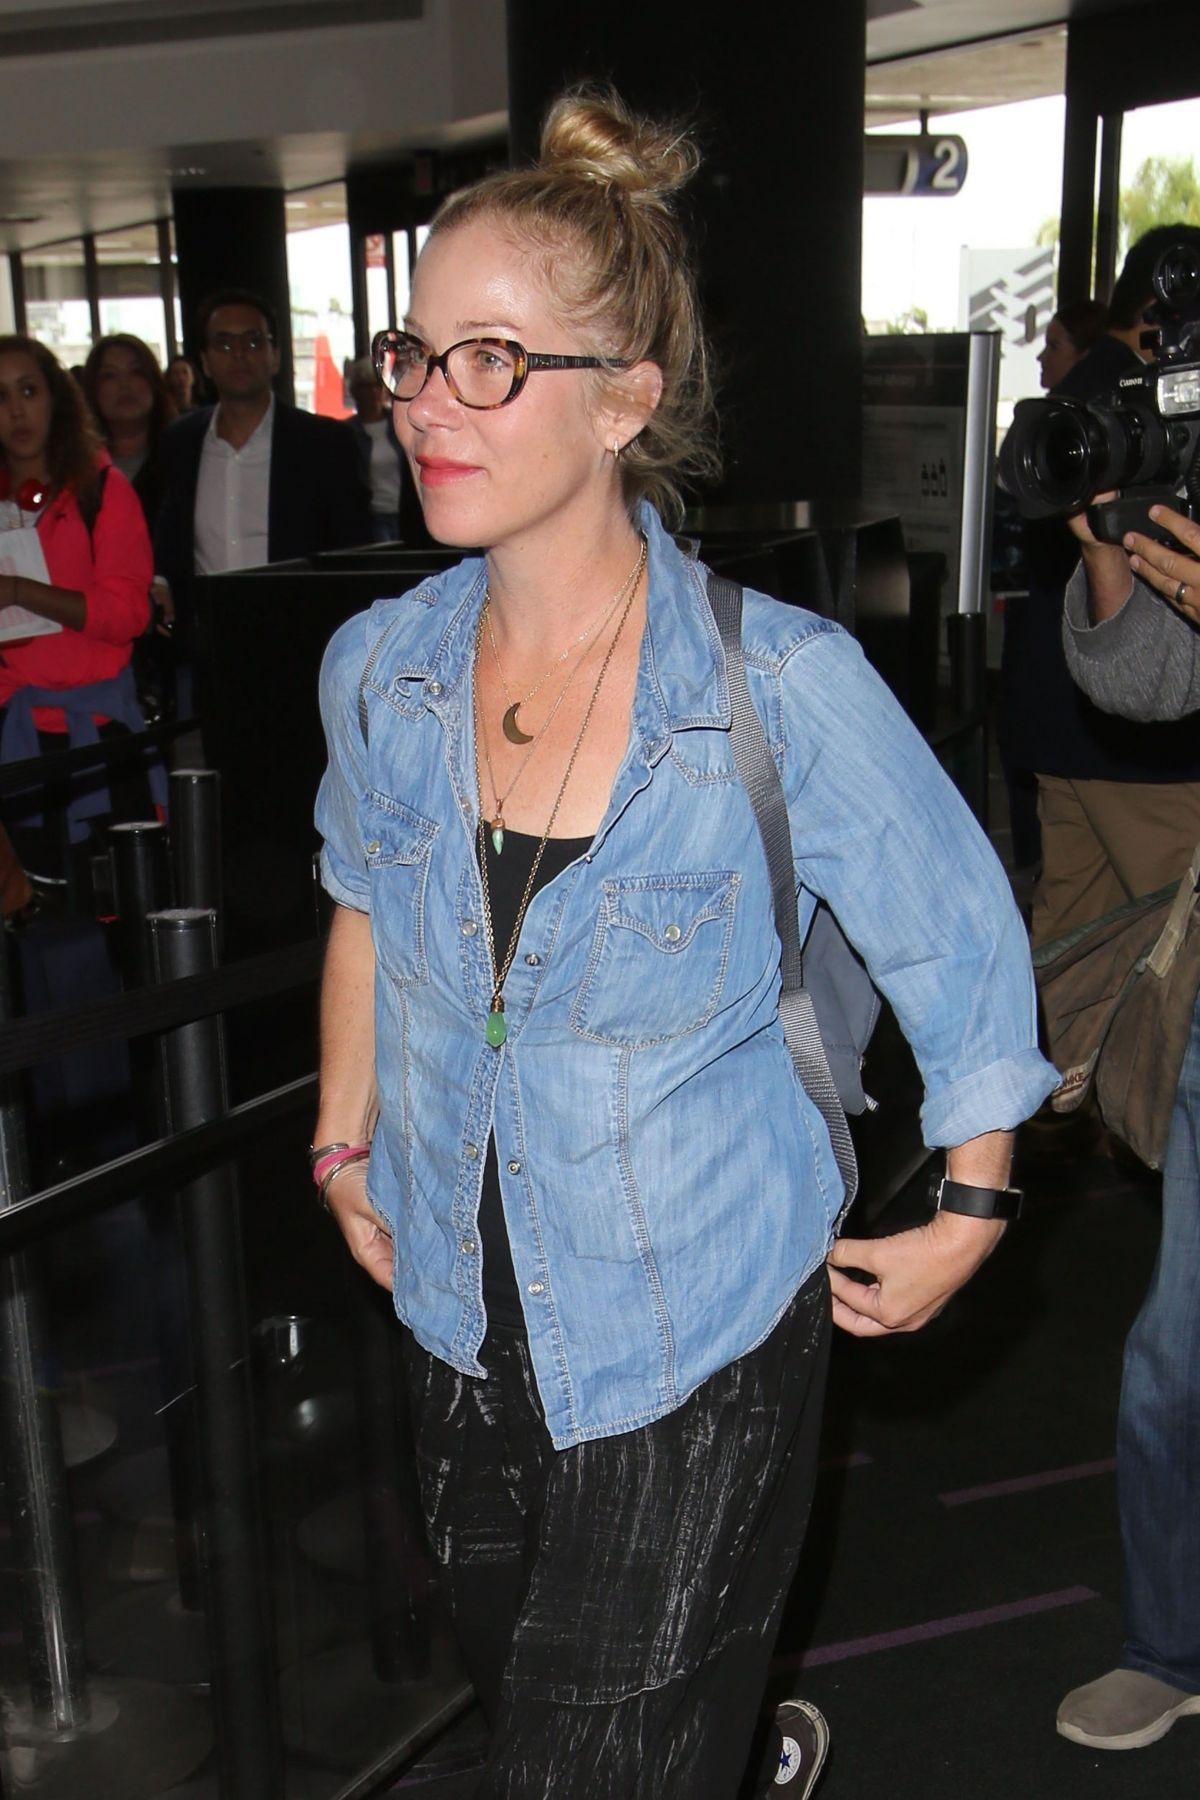 CHRISTINA APPLEGATE at Los Angeles International Airport 05/25/2017